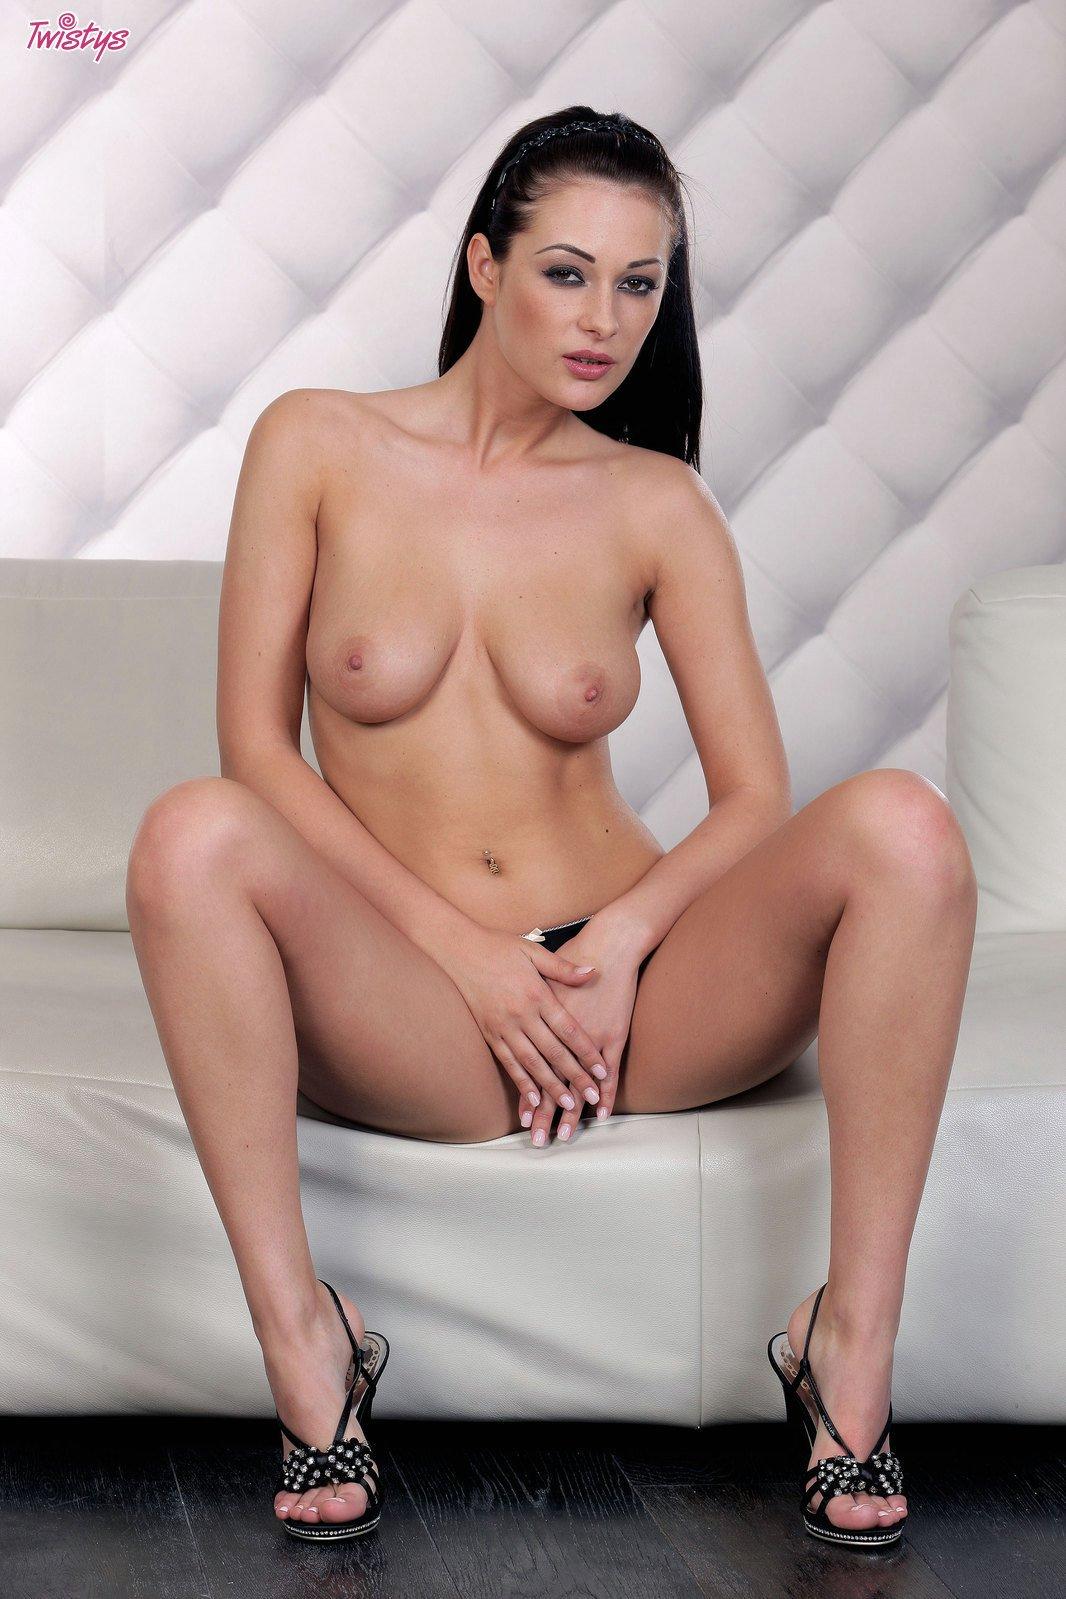 Jordan pryce anal